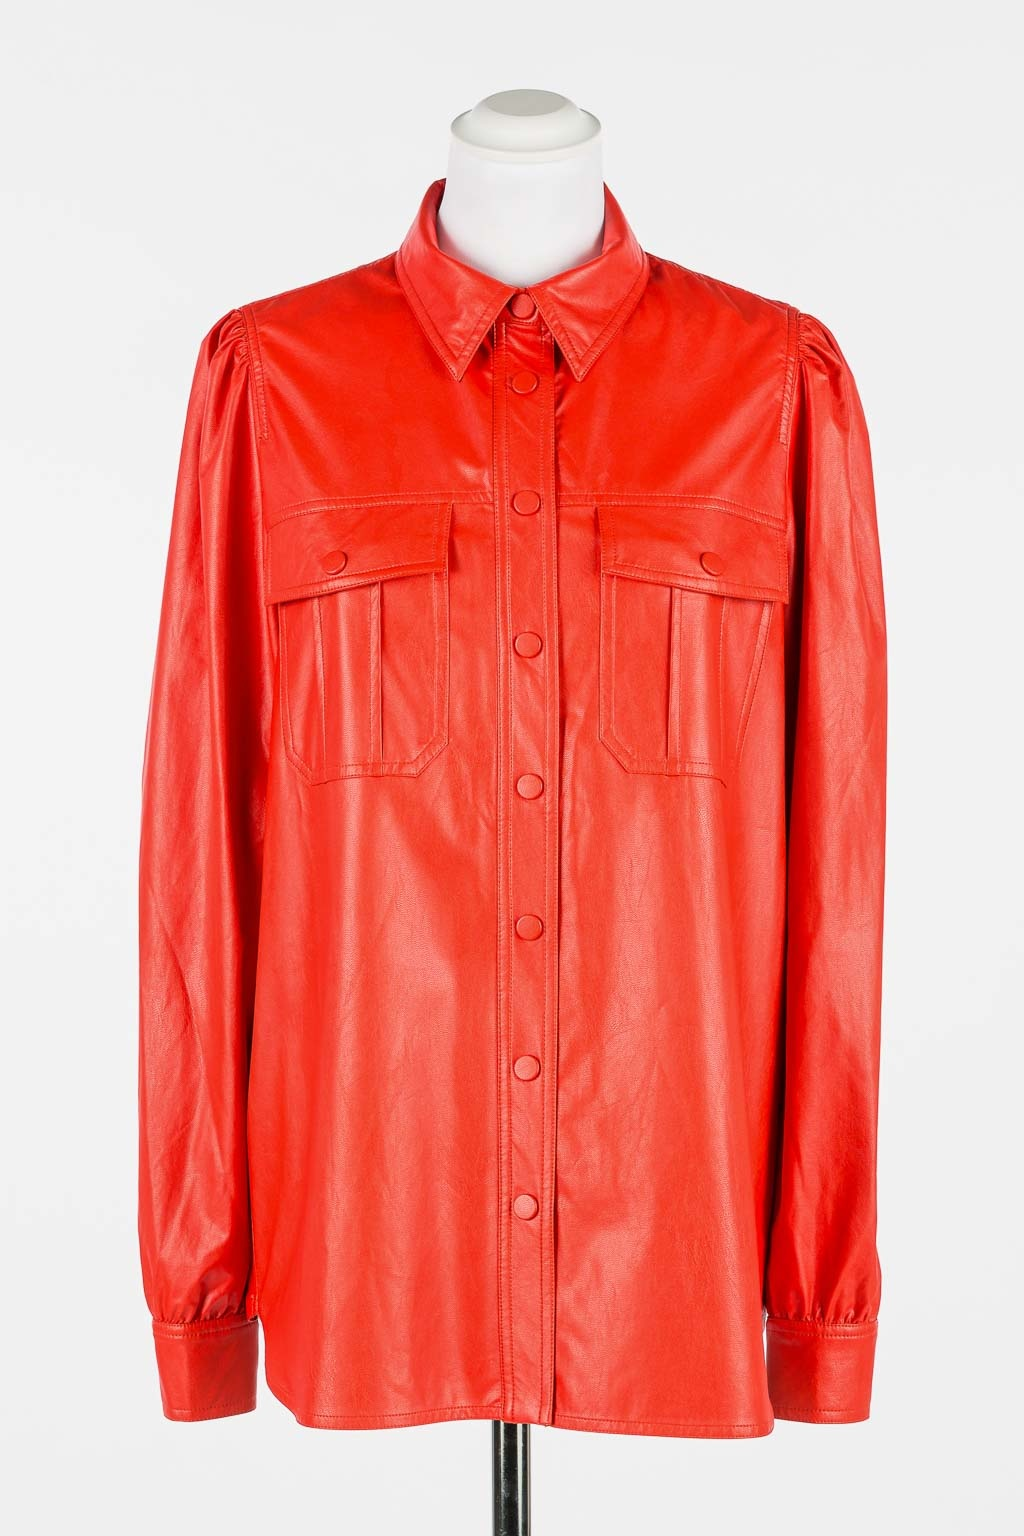 Twin-Set S/S Camicia Blouse Red orange Twin-Set